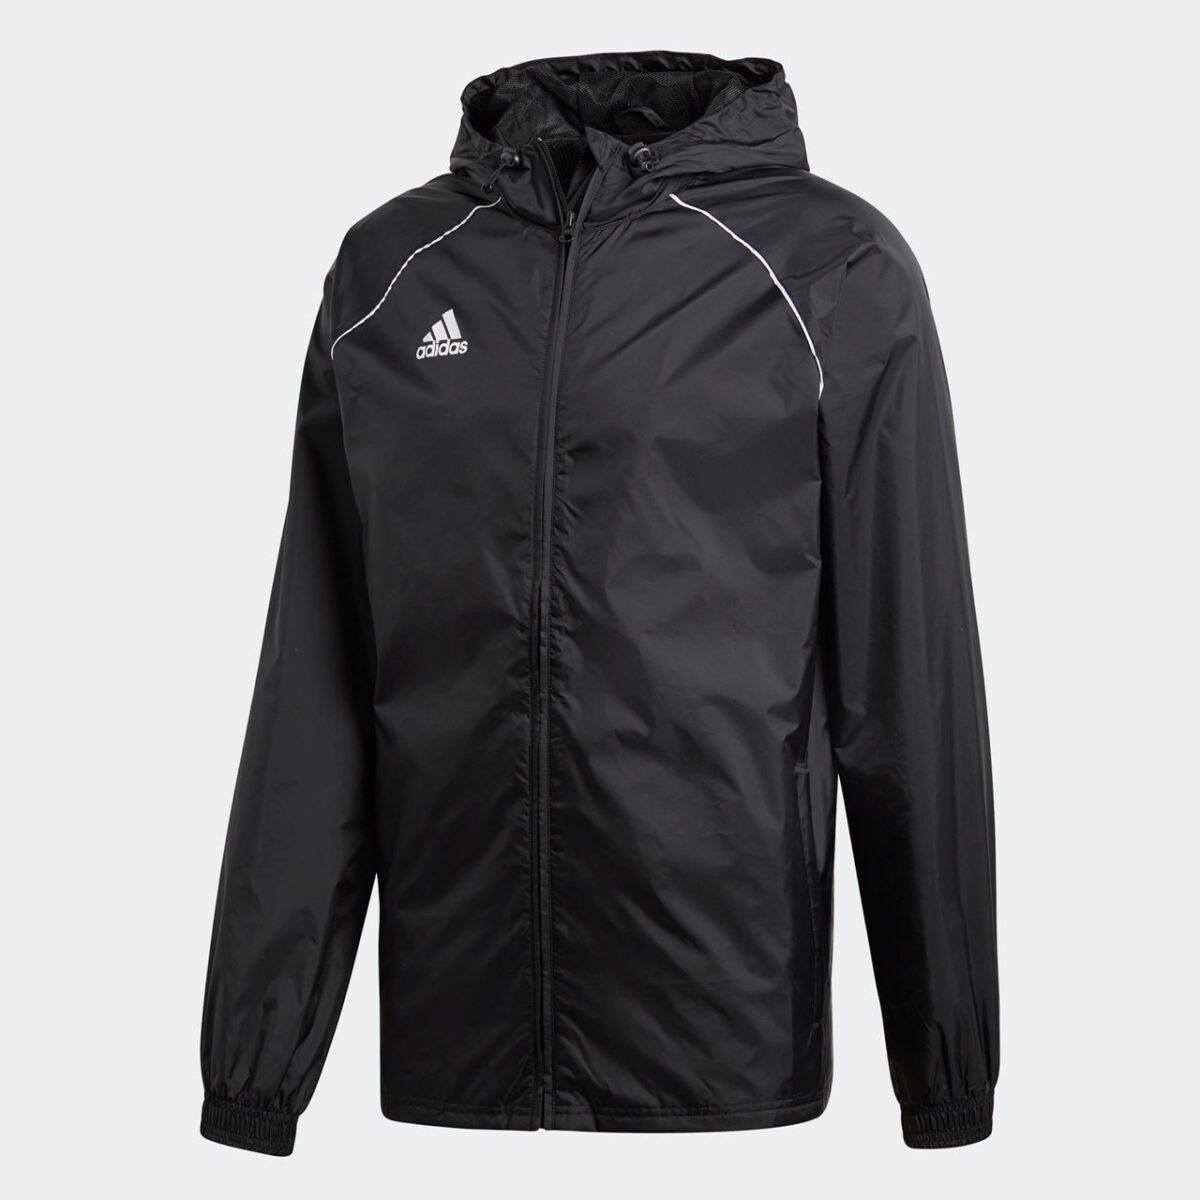 Adidas Core 18 Rain Jacket Adult